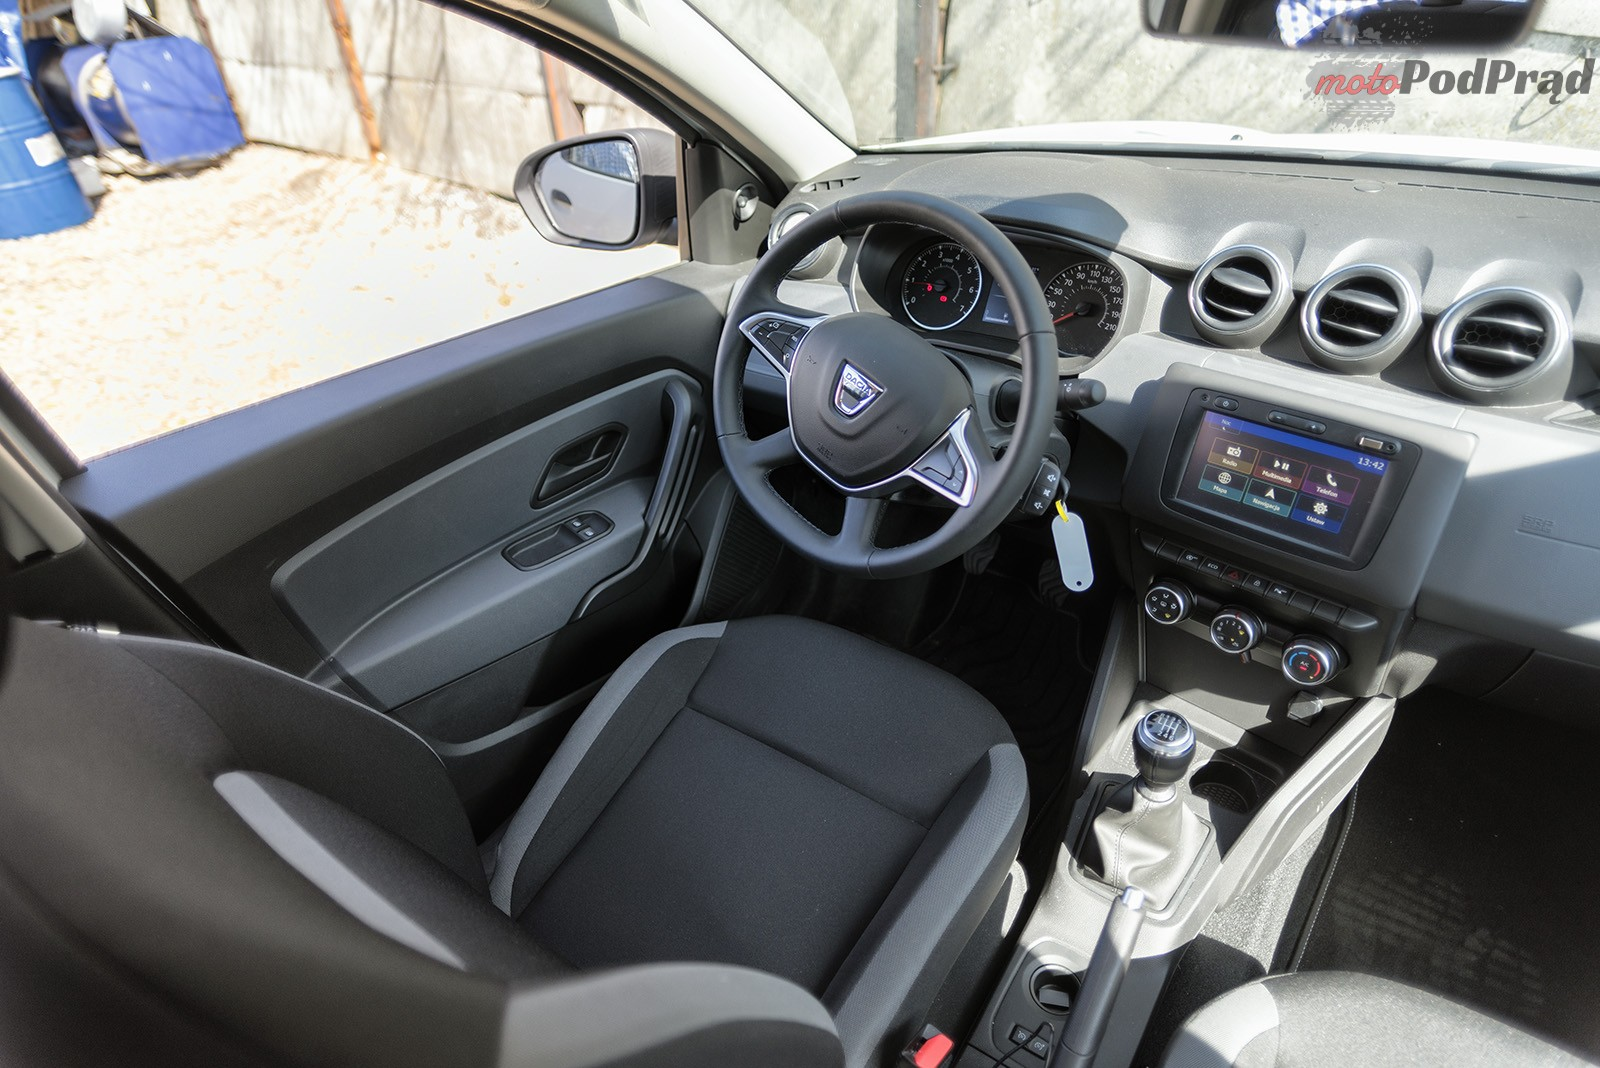 Dacia Duster 19 Test: Dacia Duster 1.5dci 90 KM   wiesz za co płacisz